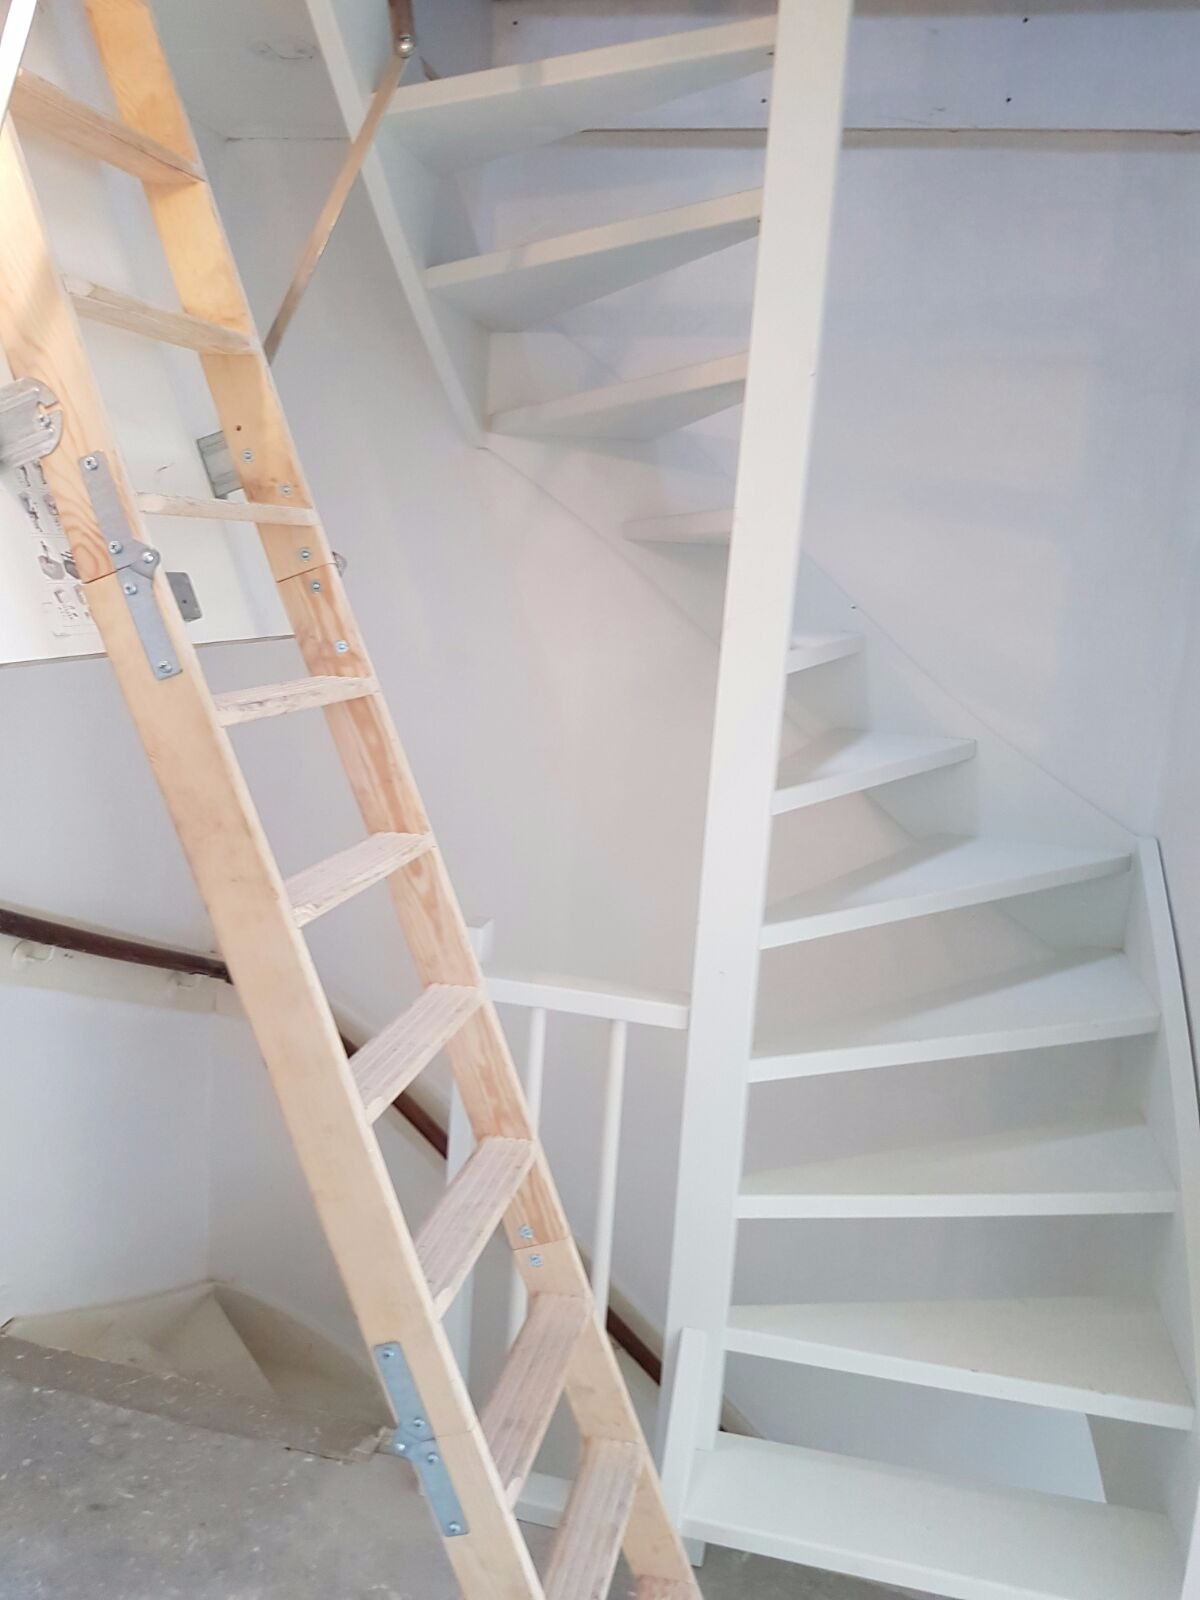 Onze trappenfabriek vaste trap trappenspecialist de for Wat kost een vlizotrap